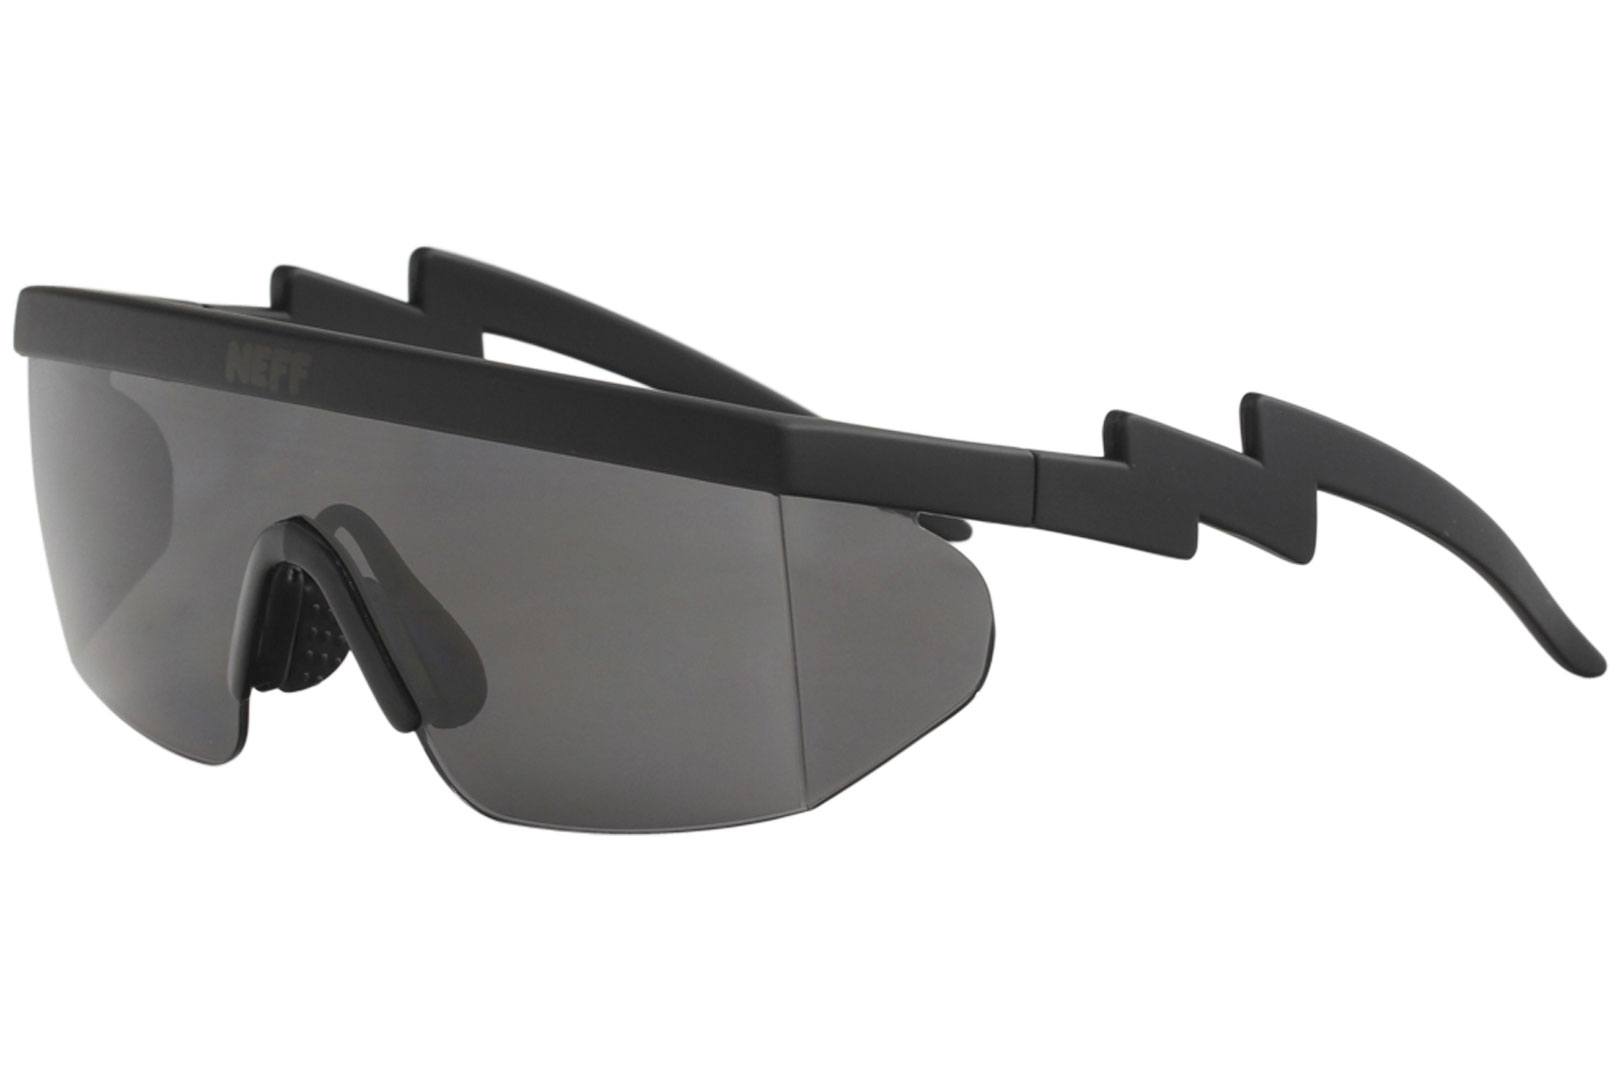 2684aeddf4 Neff Brodie NF0304 NF 0304 Black Rubber Fashion Shield Sunglasses ...